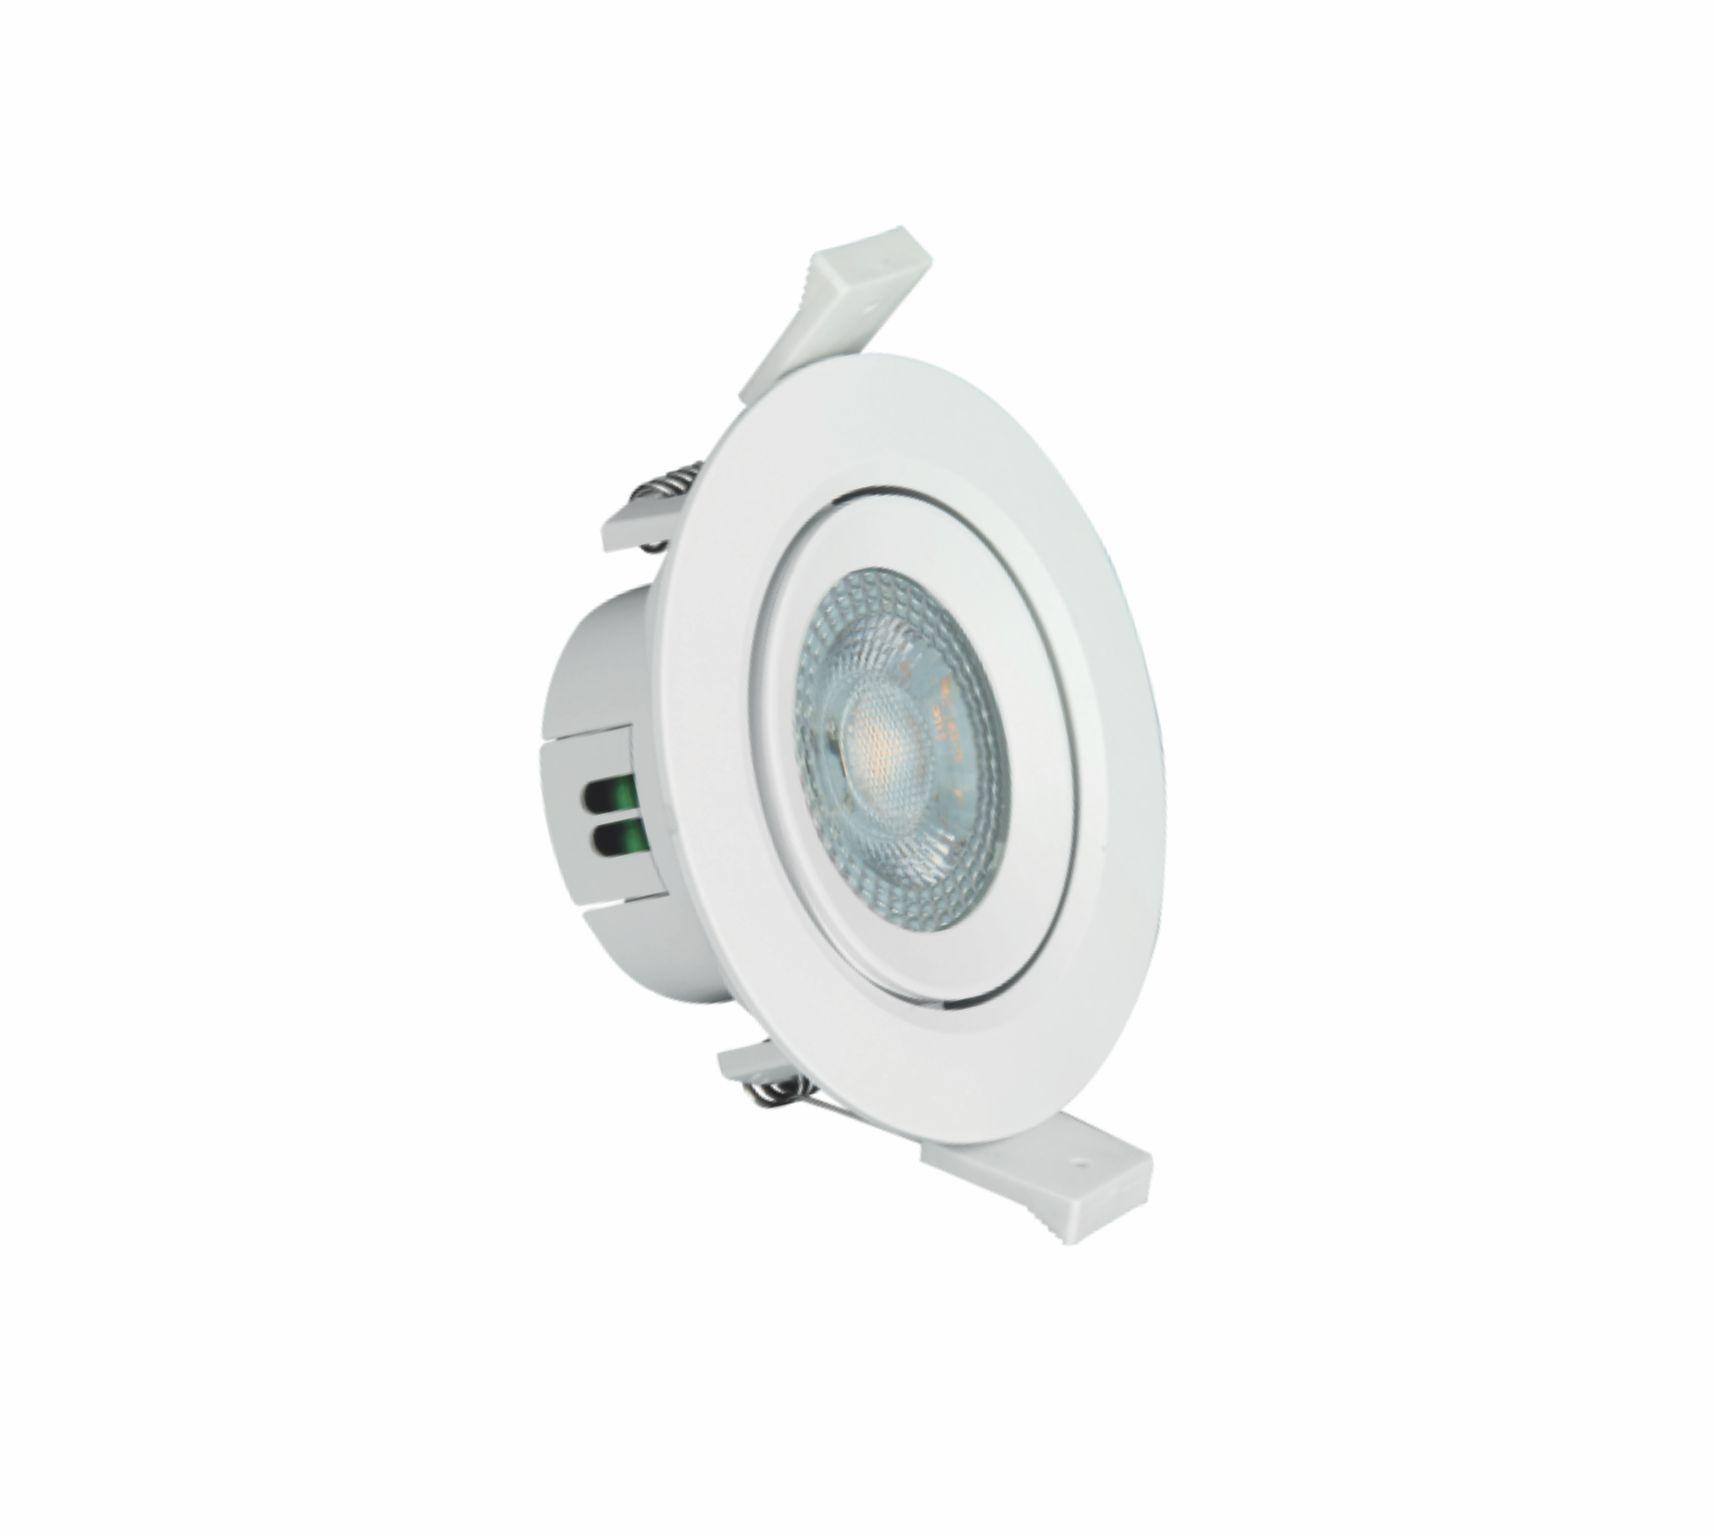 Spot LED Redondo PAR20 8W 3000K Branco AUTOVOLT